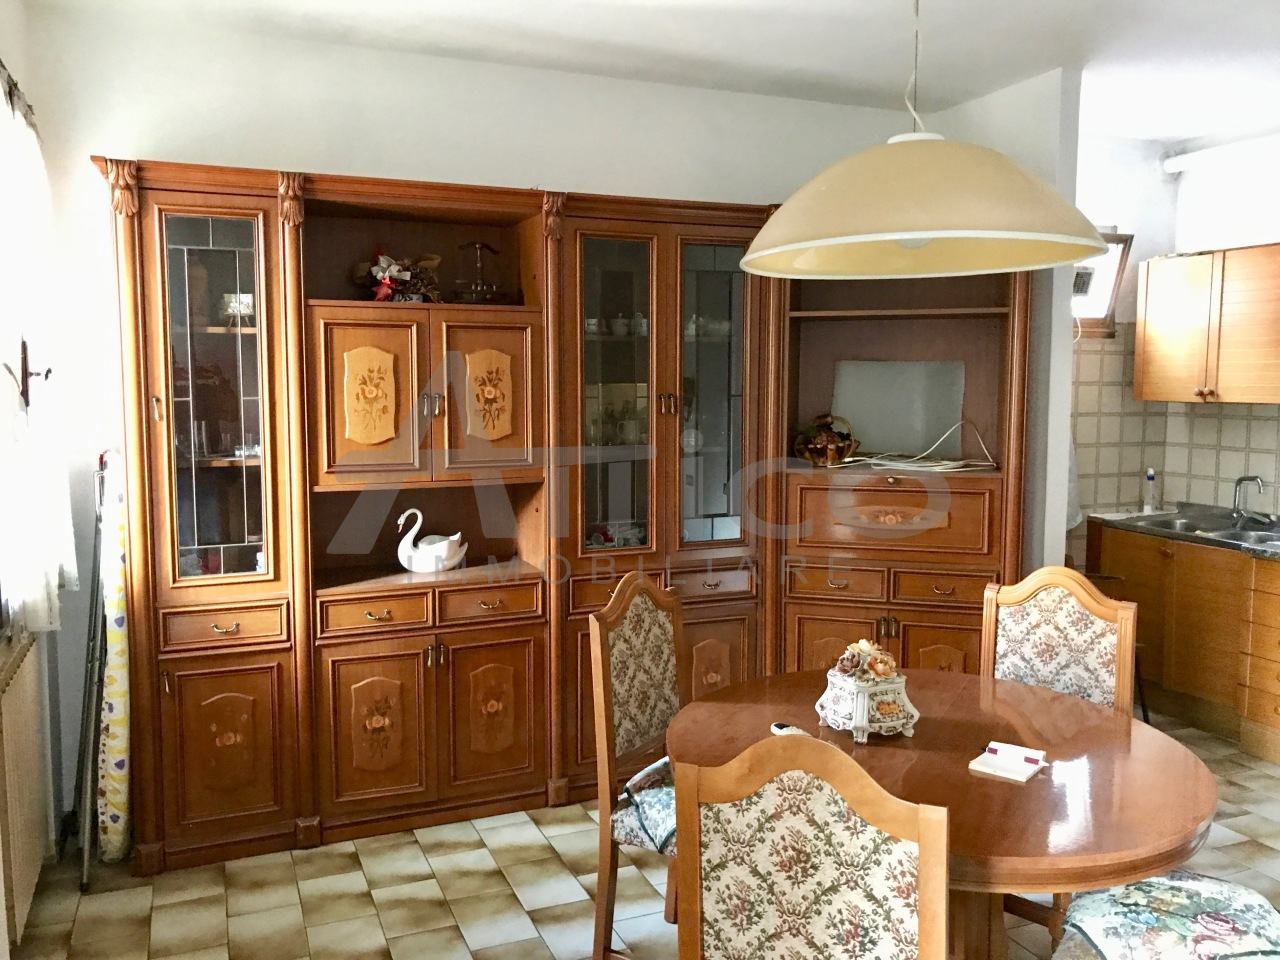 Appartamento - Bilocale a Commenda Ovest, Rovigo